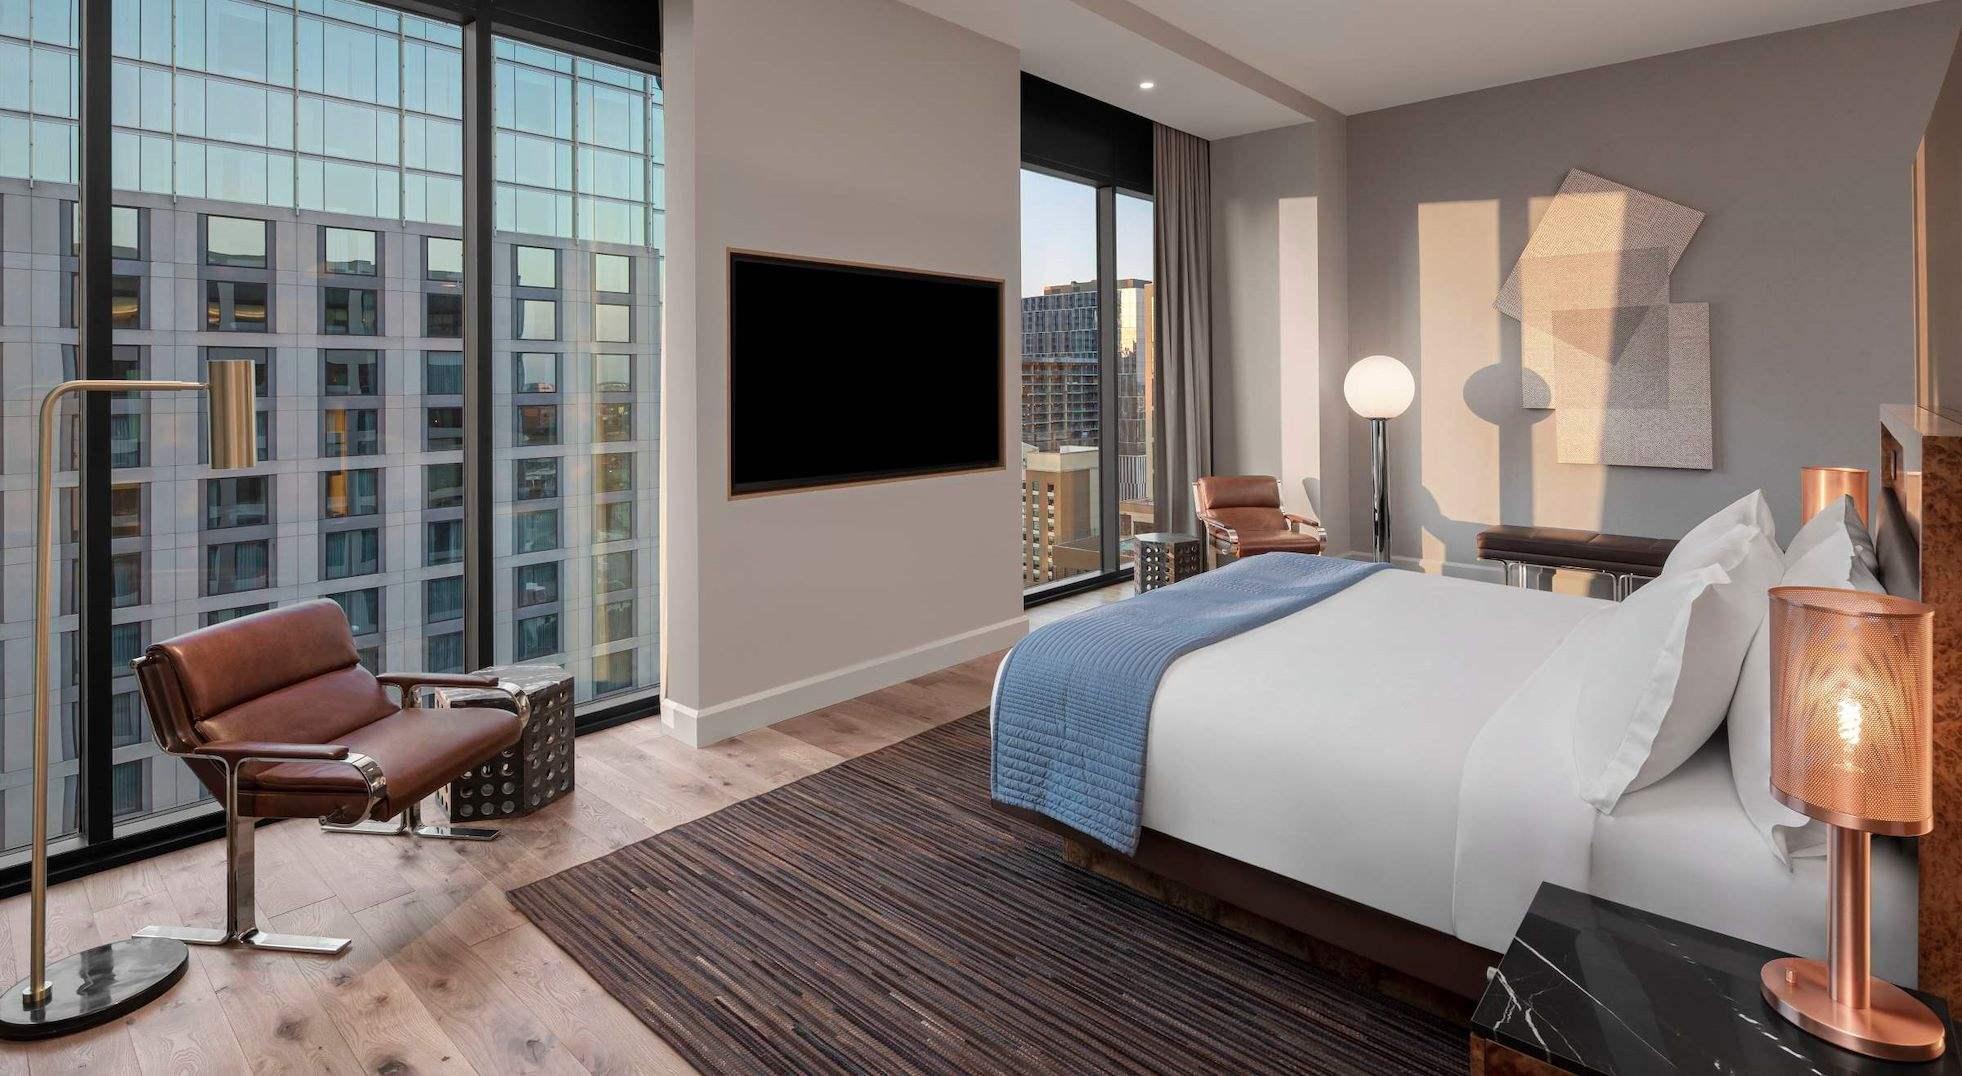 Penthouse Suite in The Joseph Hotel, Nashville